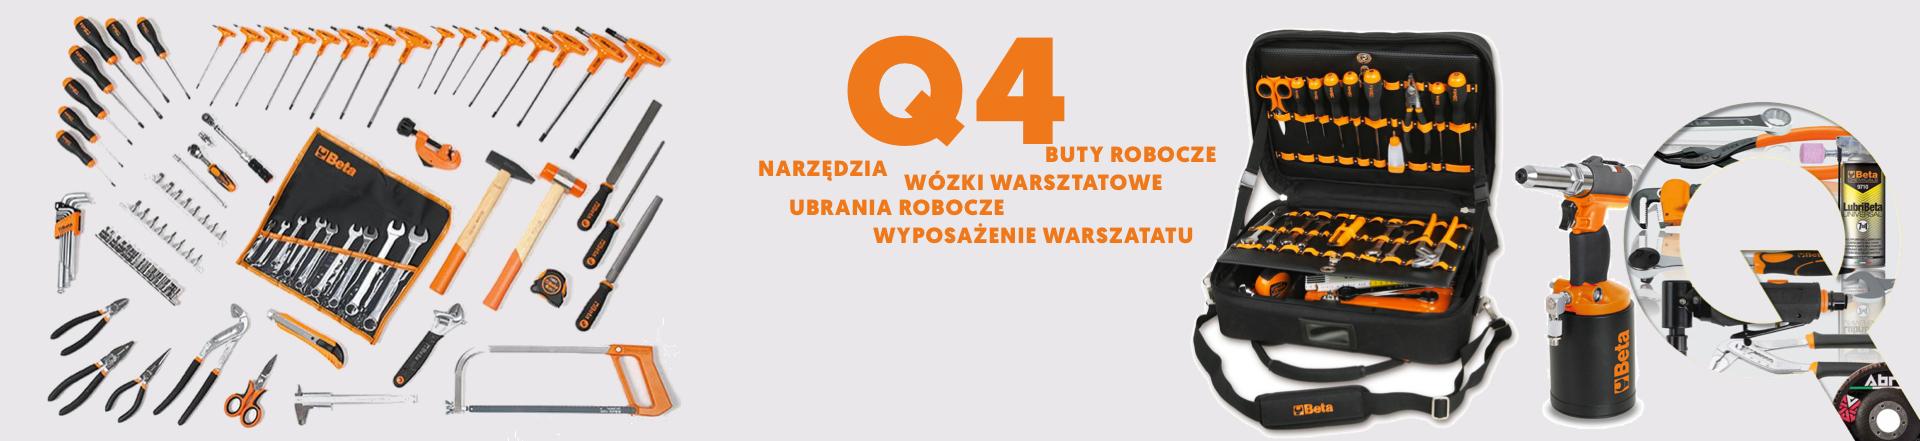 PROMOCJA BETA Q4